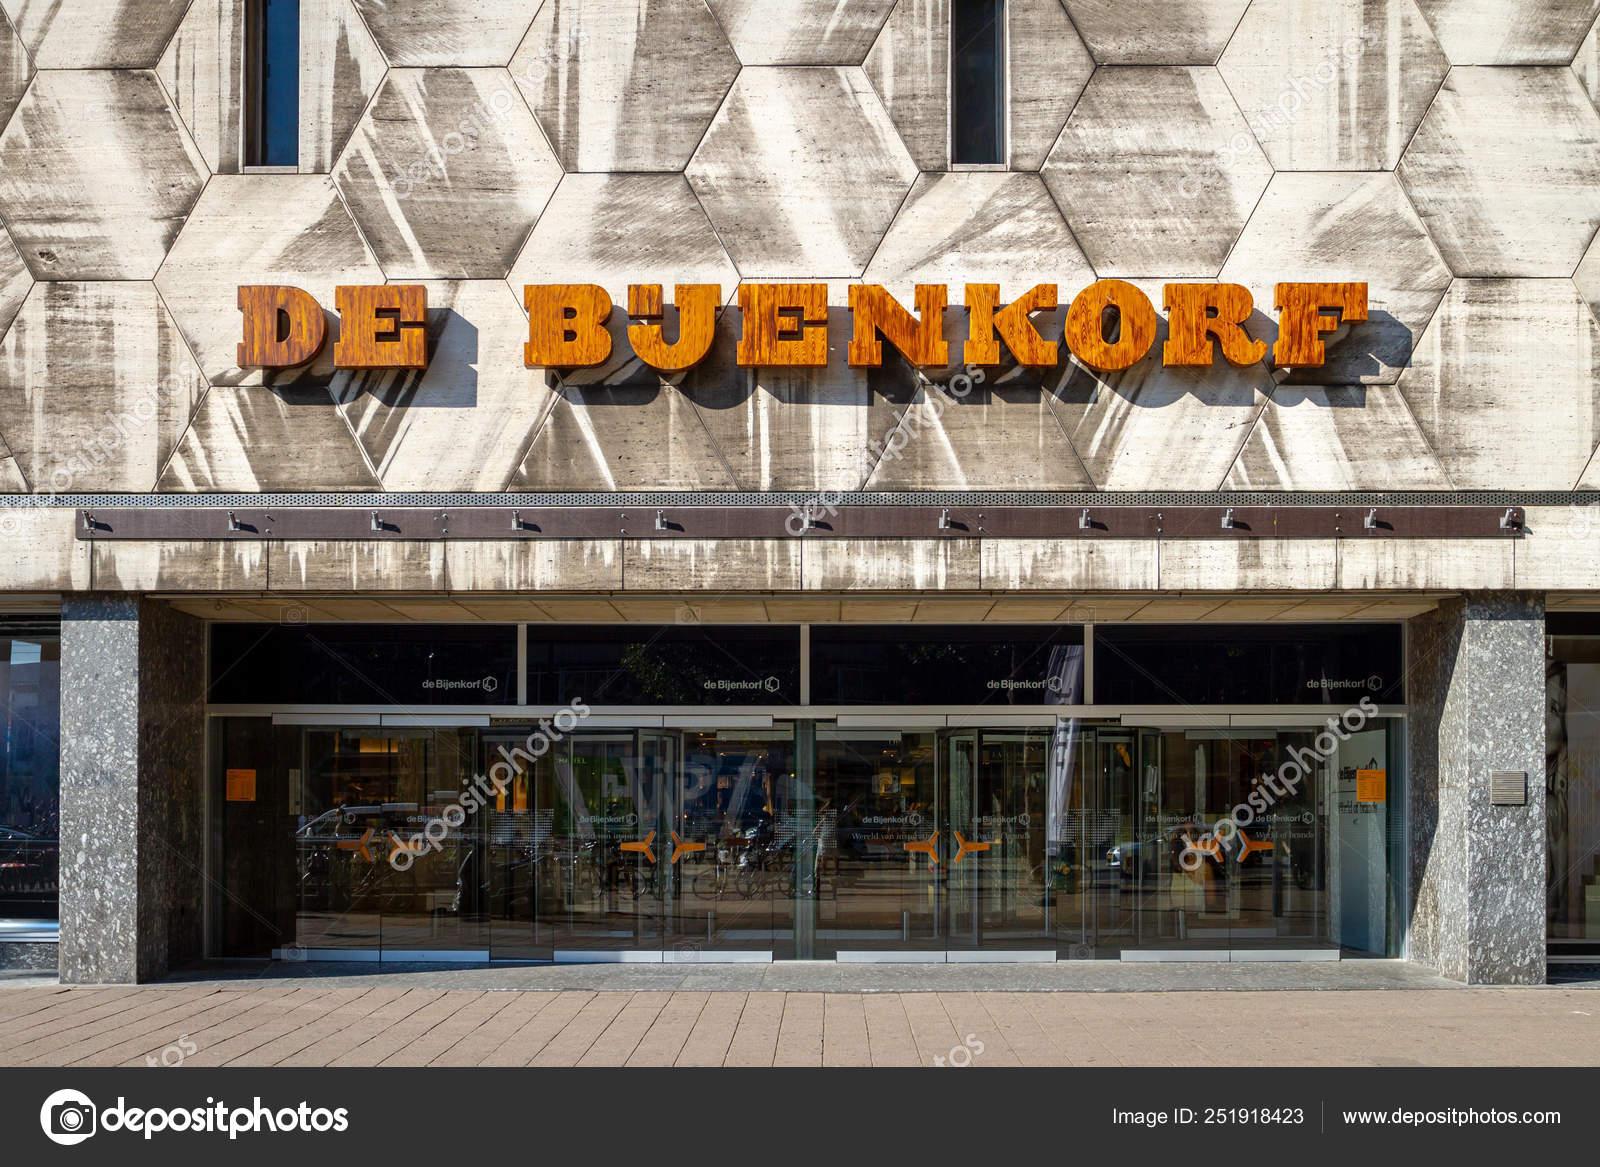 De Bijenkorf name above the Rotterdam store entrance – Stock